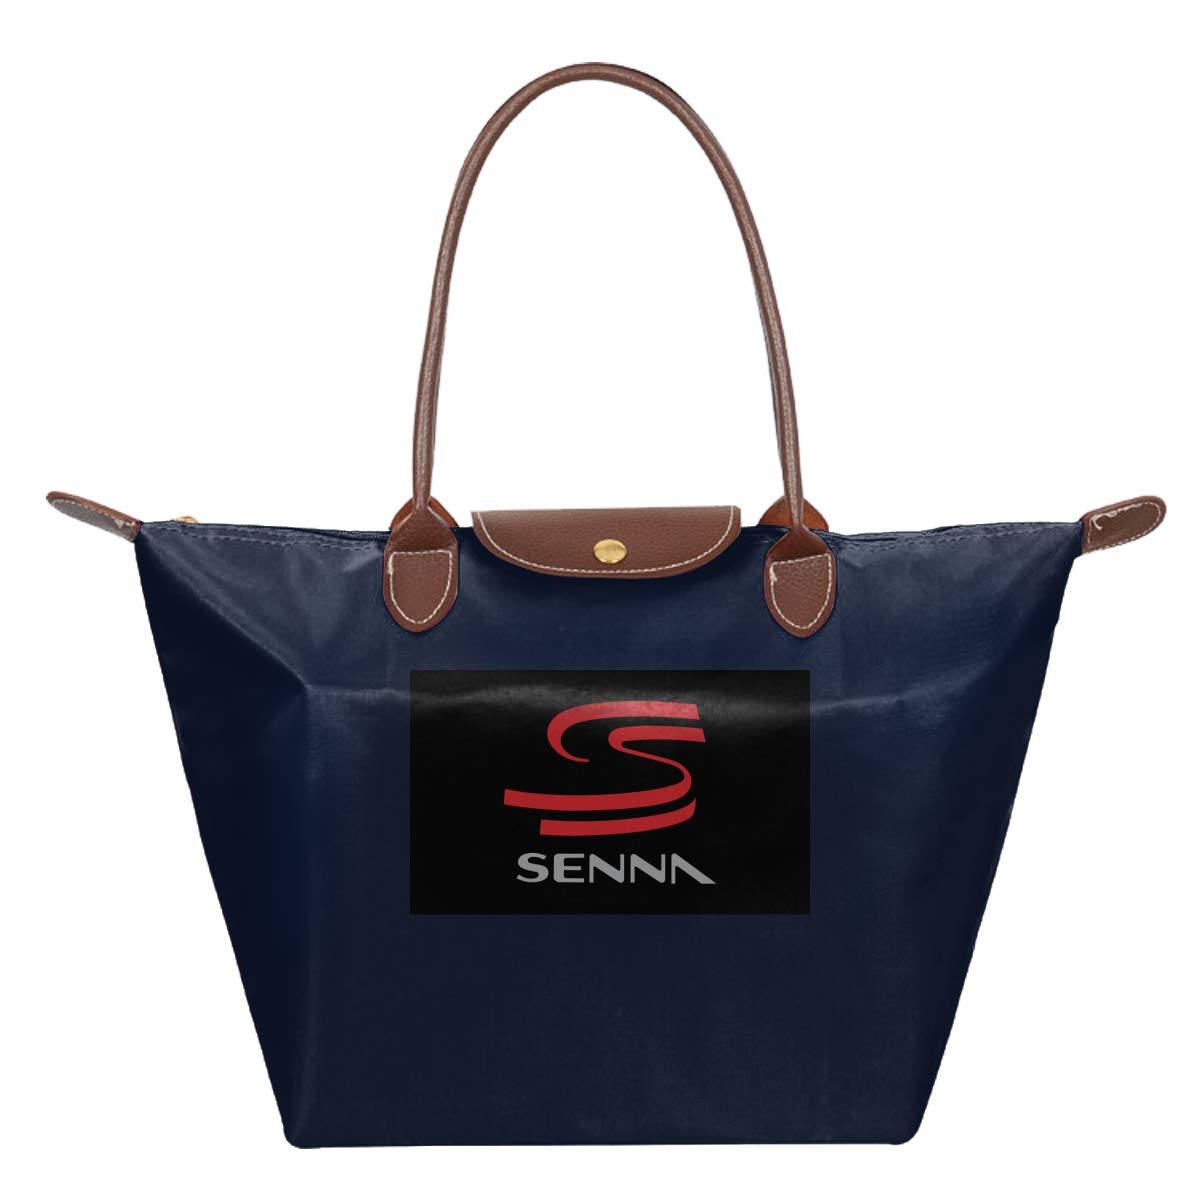 Ayrton Senna Logo Waterproof Leather Folded Messenger Nylon Bag Travel Tote Hopping Folding School Handbags